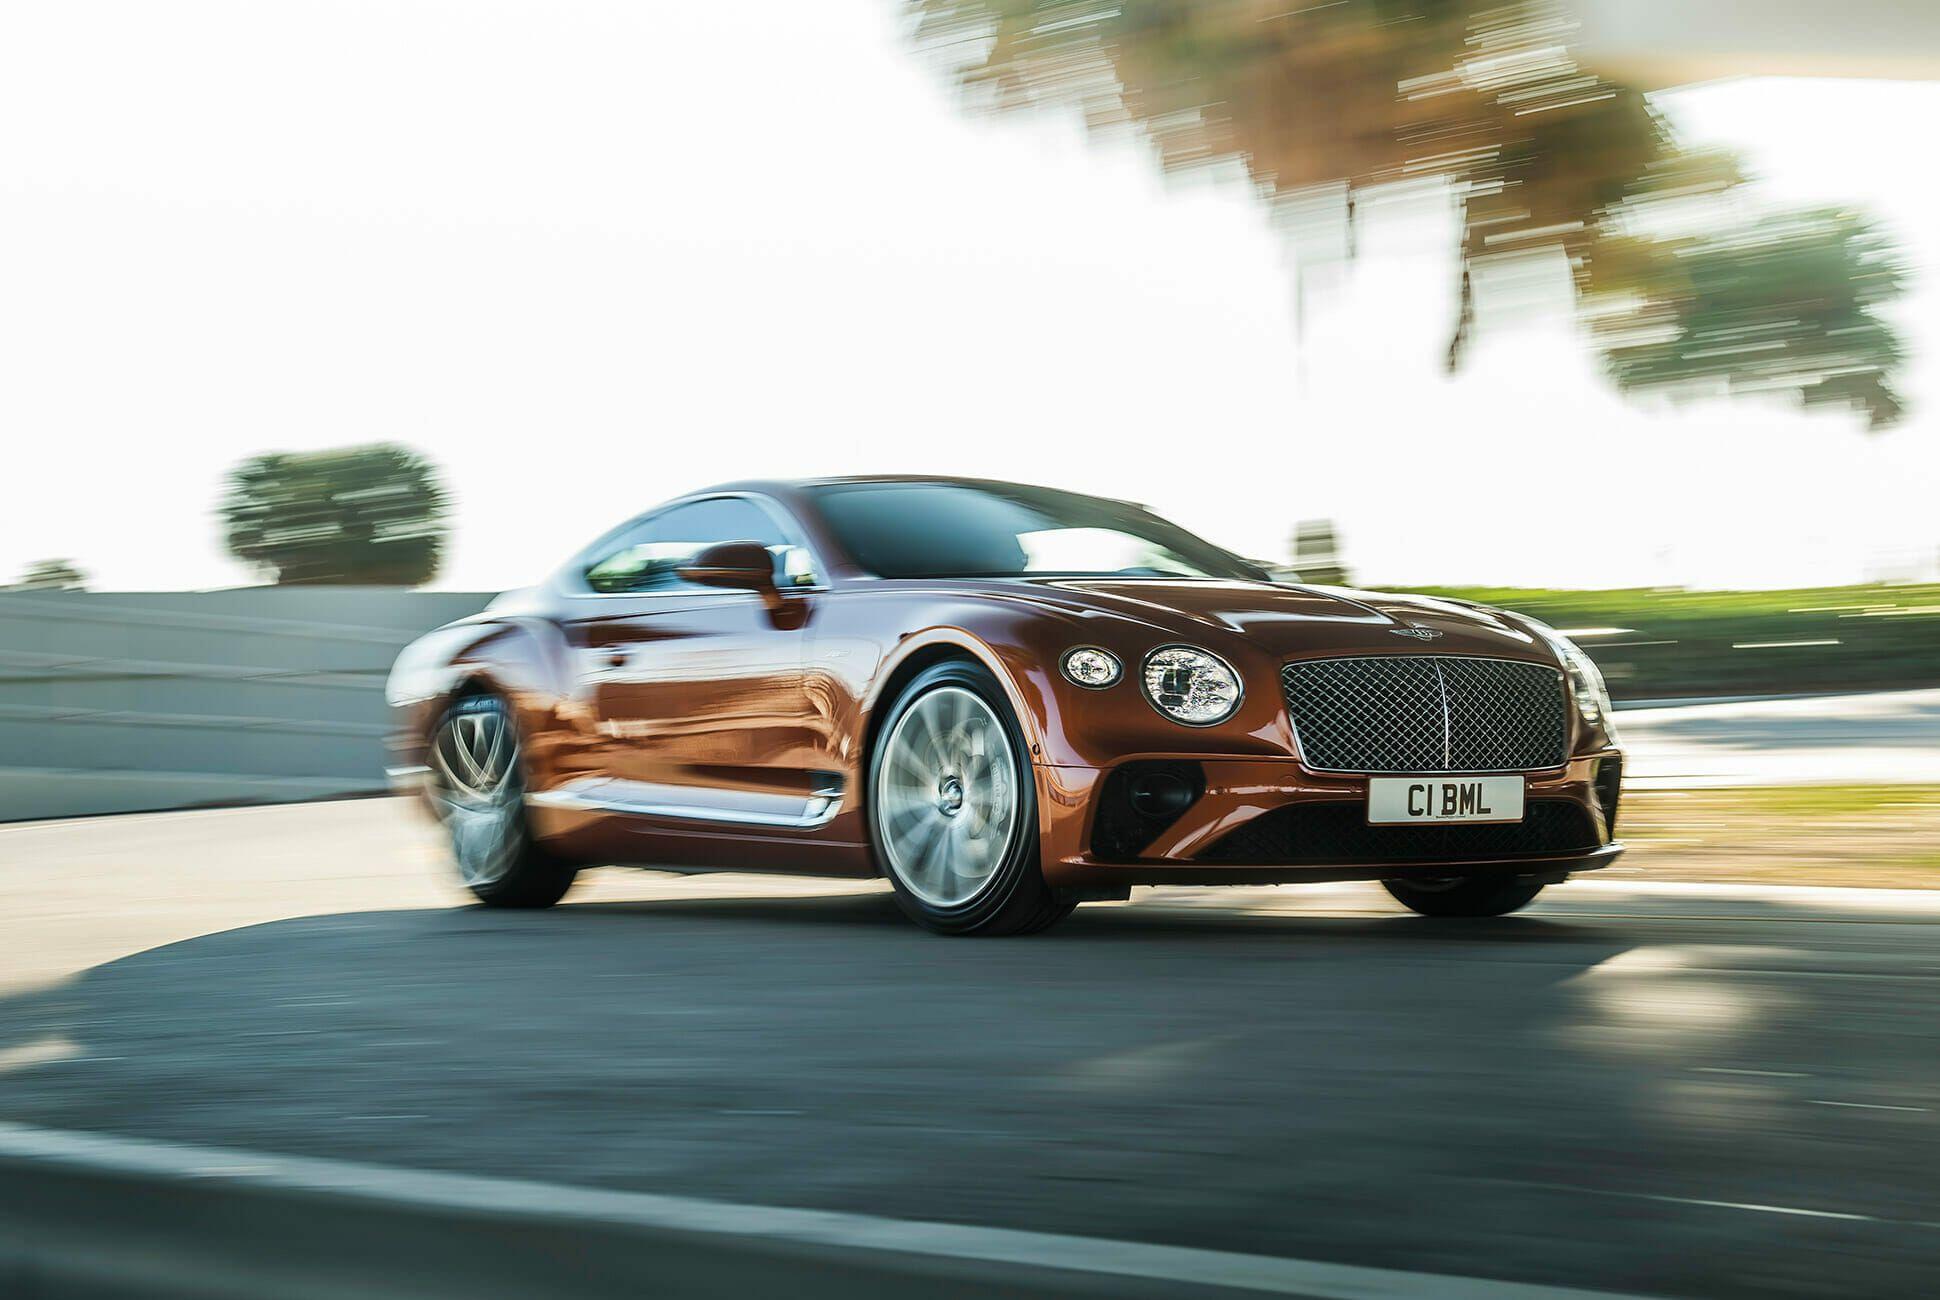 Bentley-Continental-GT-Convertible-V8-gear-patrol-slide-04